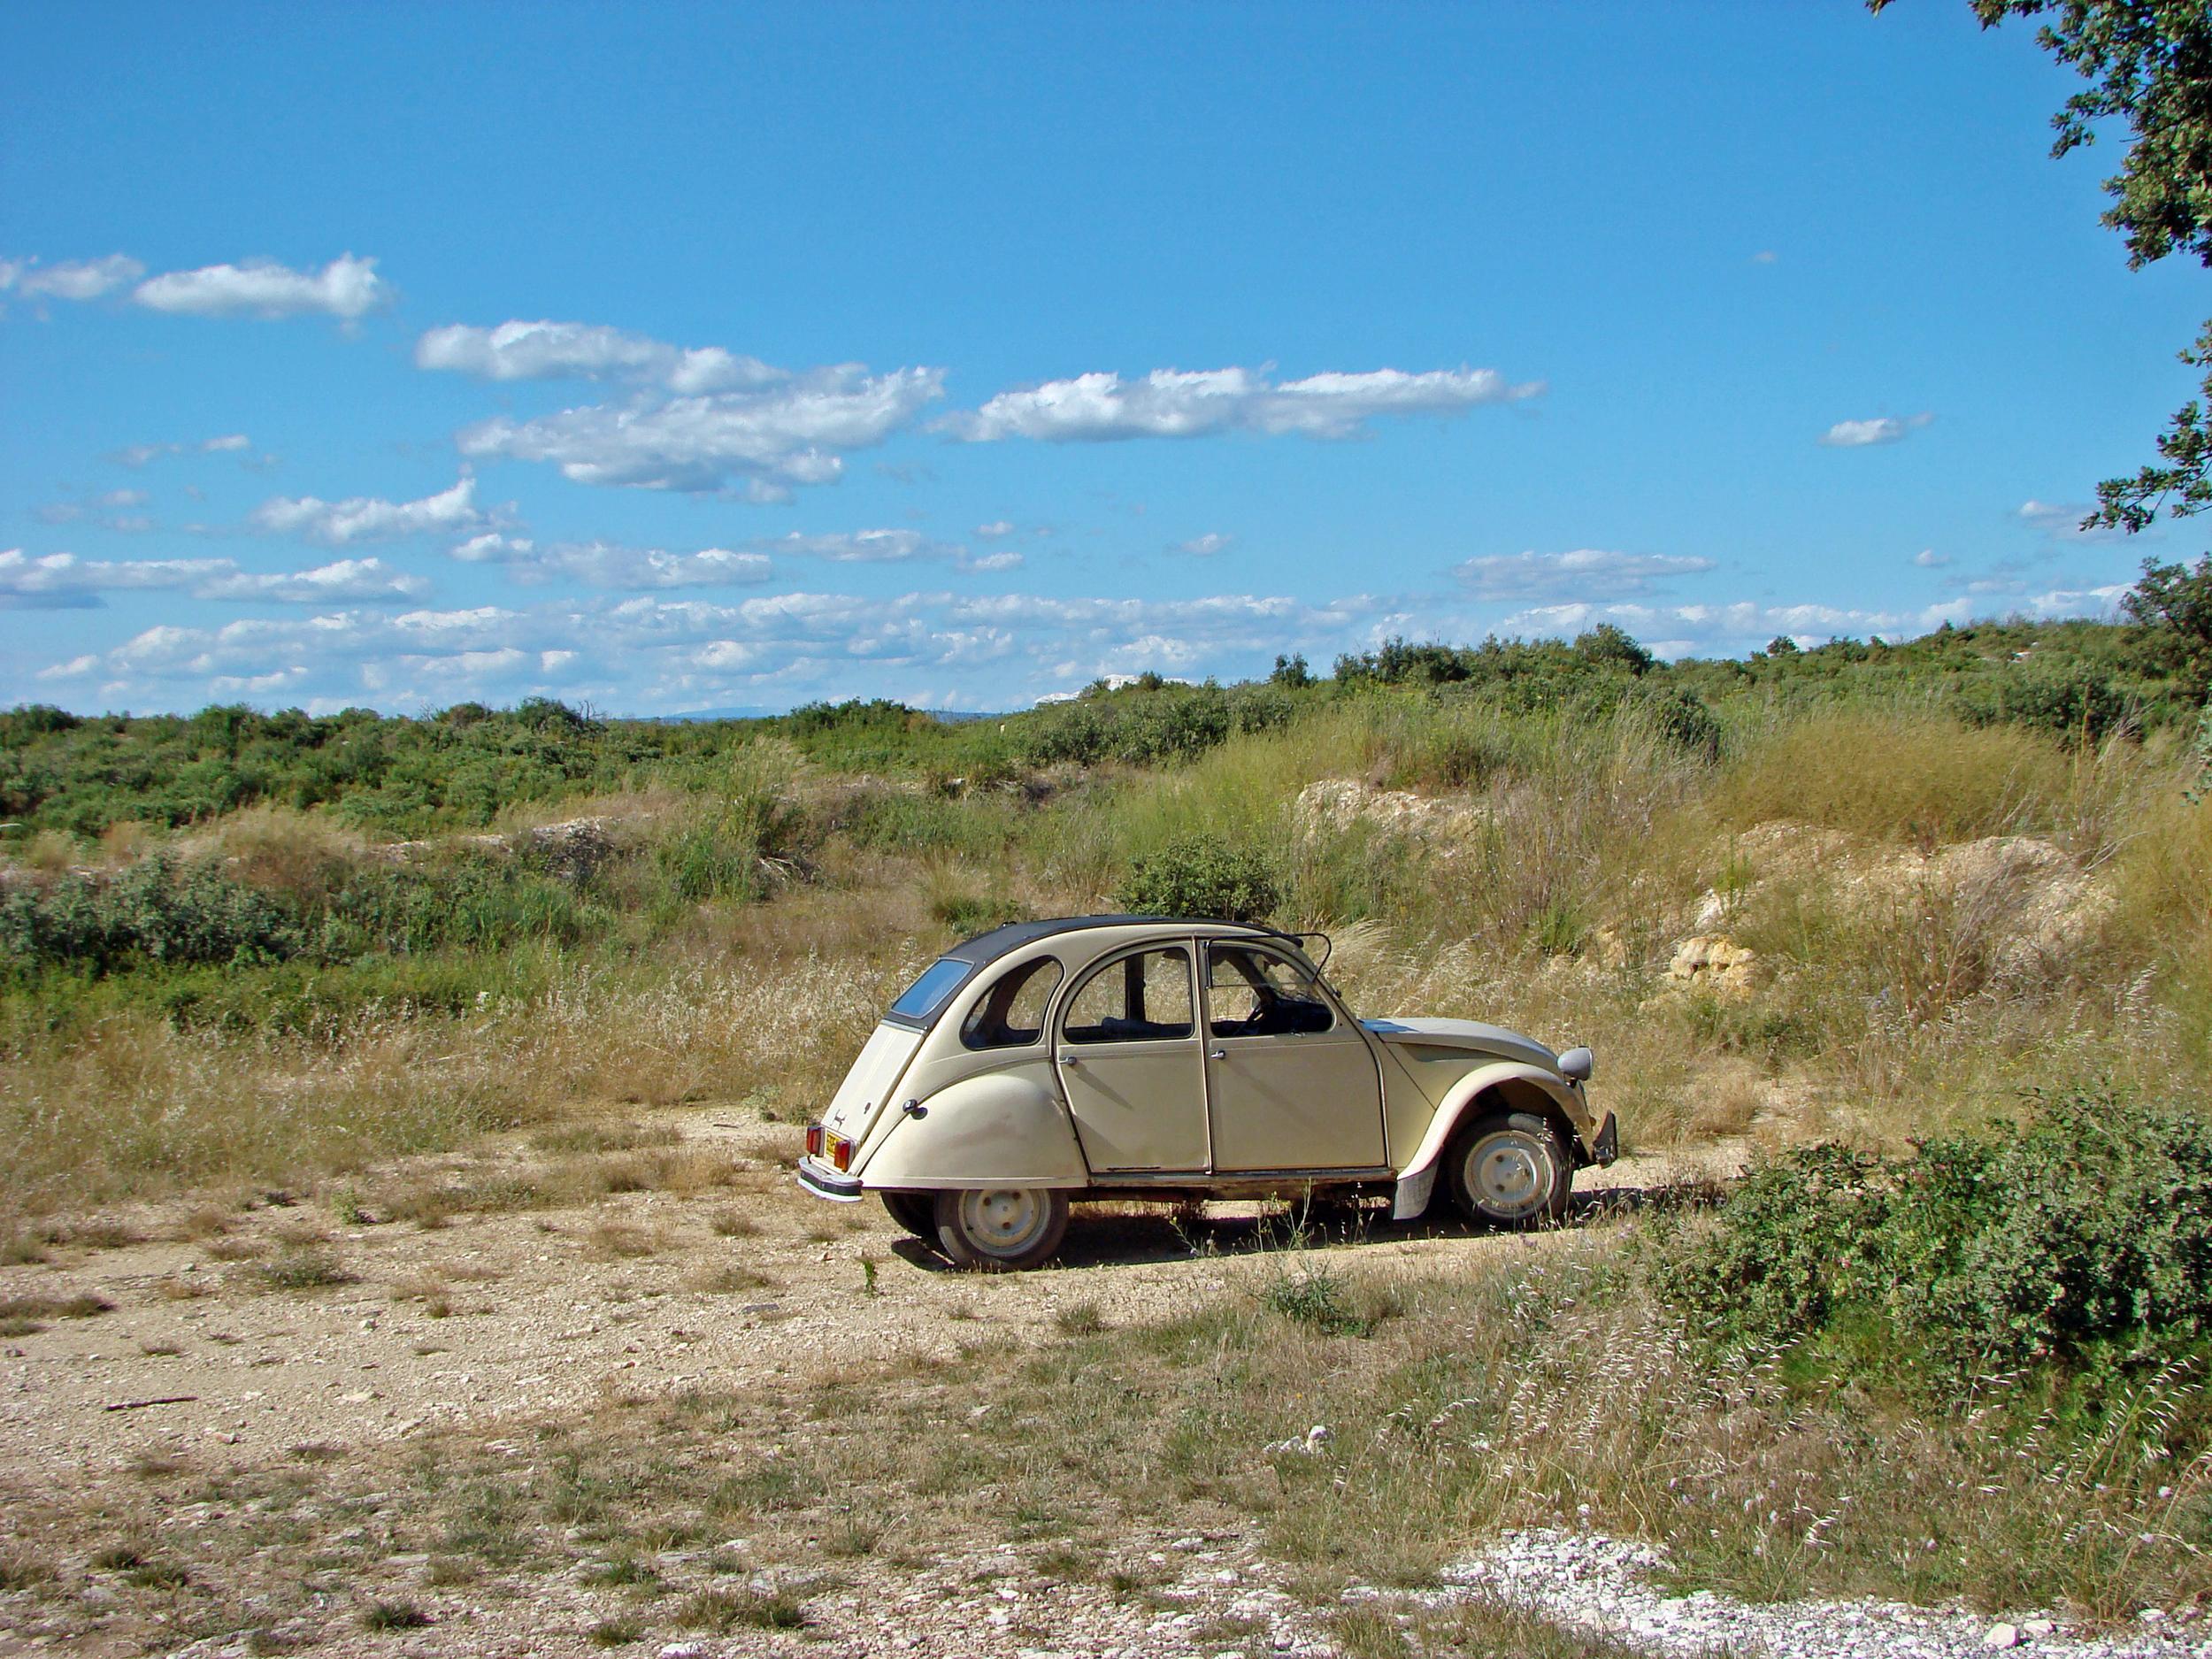 1978 Citroen 2cv in countryside